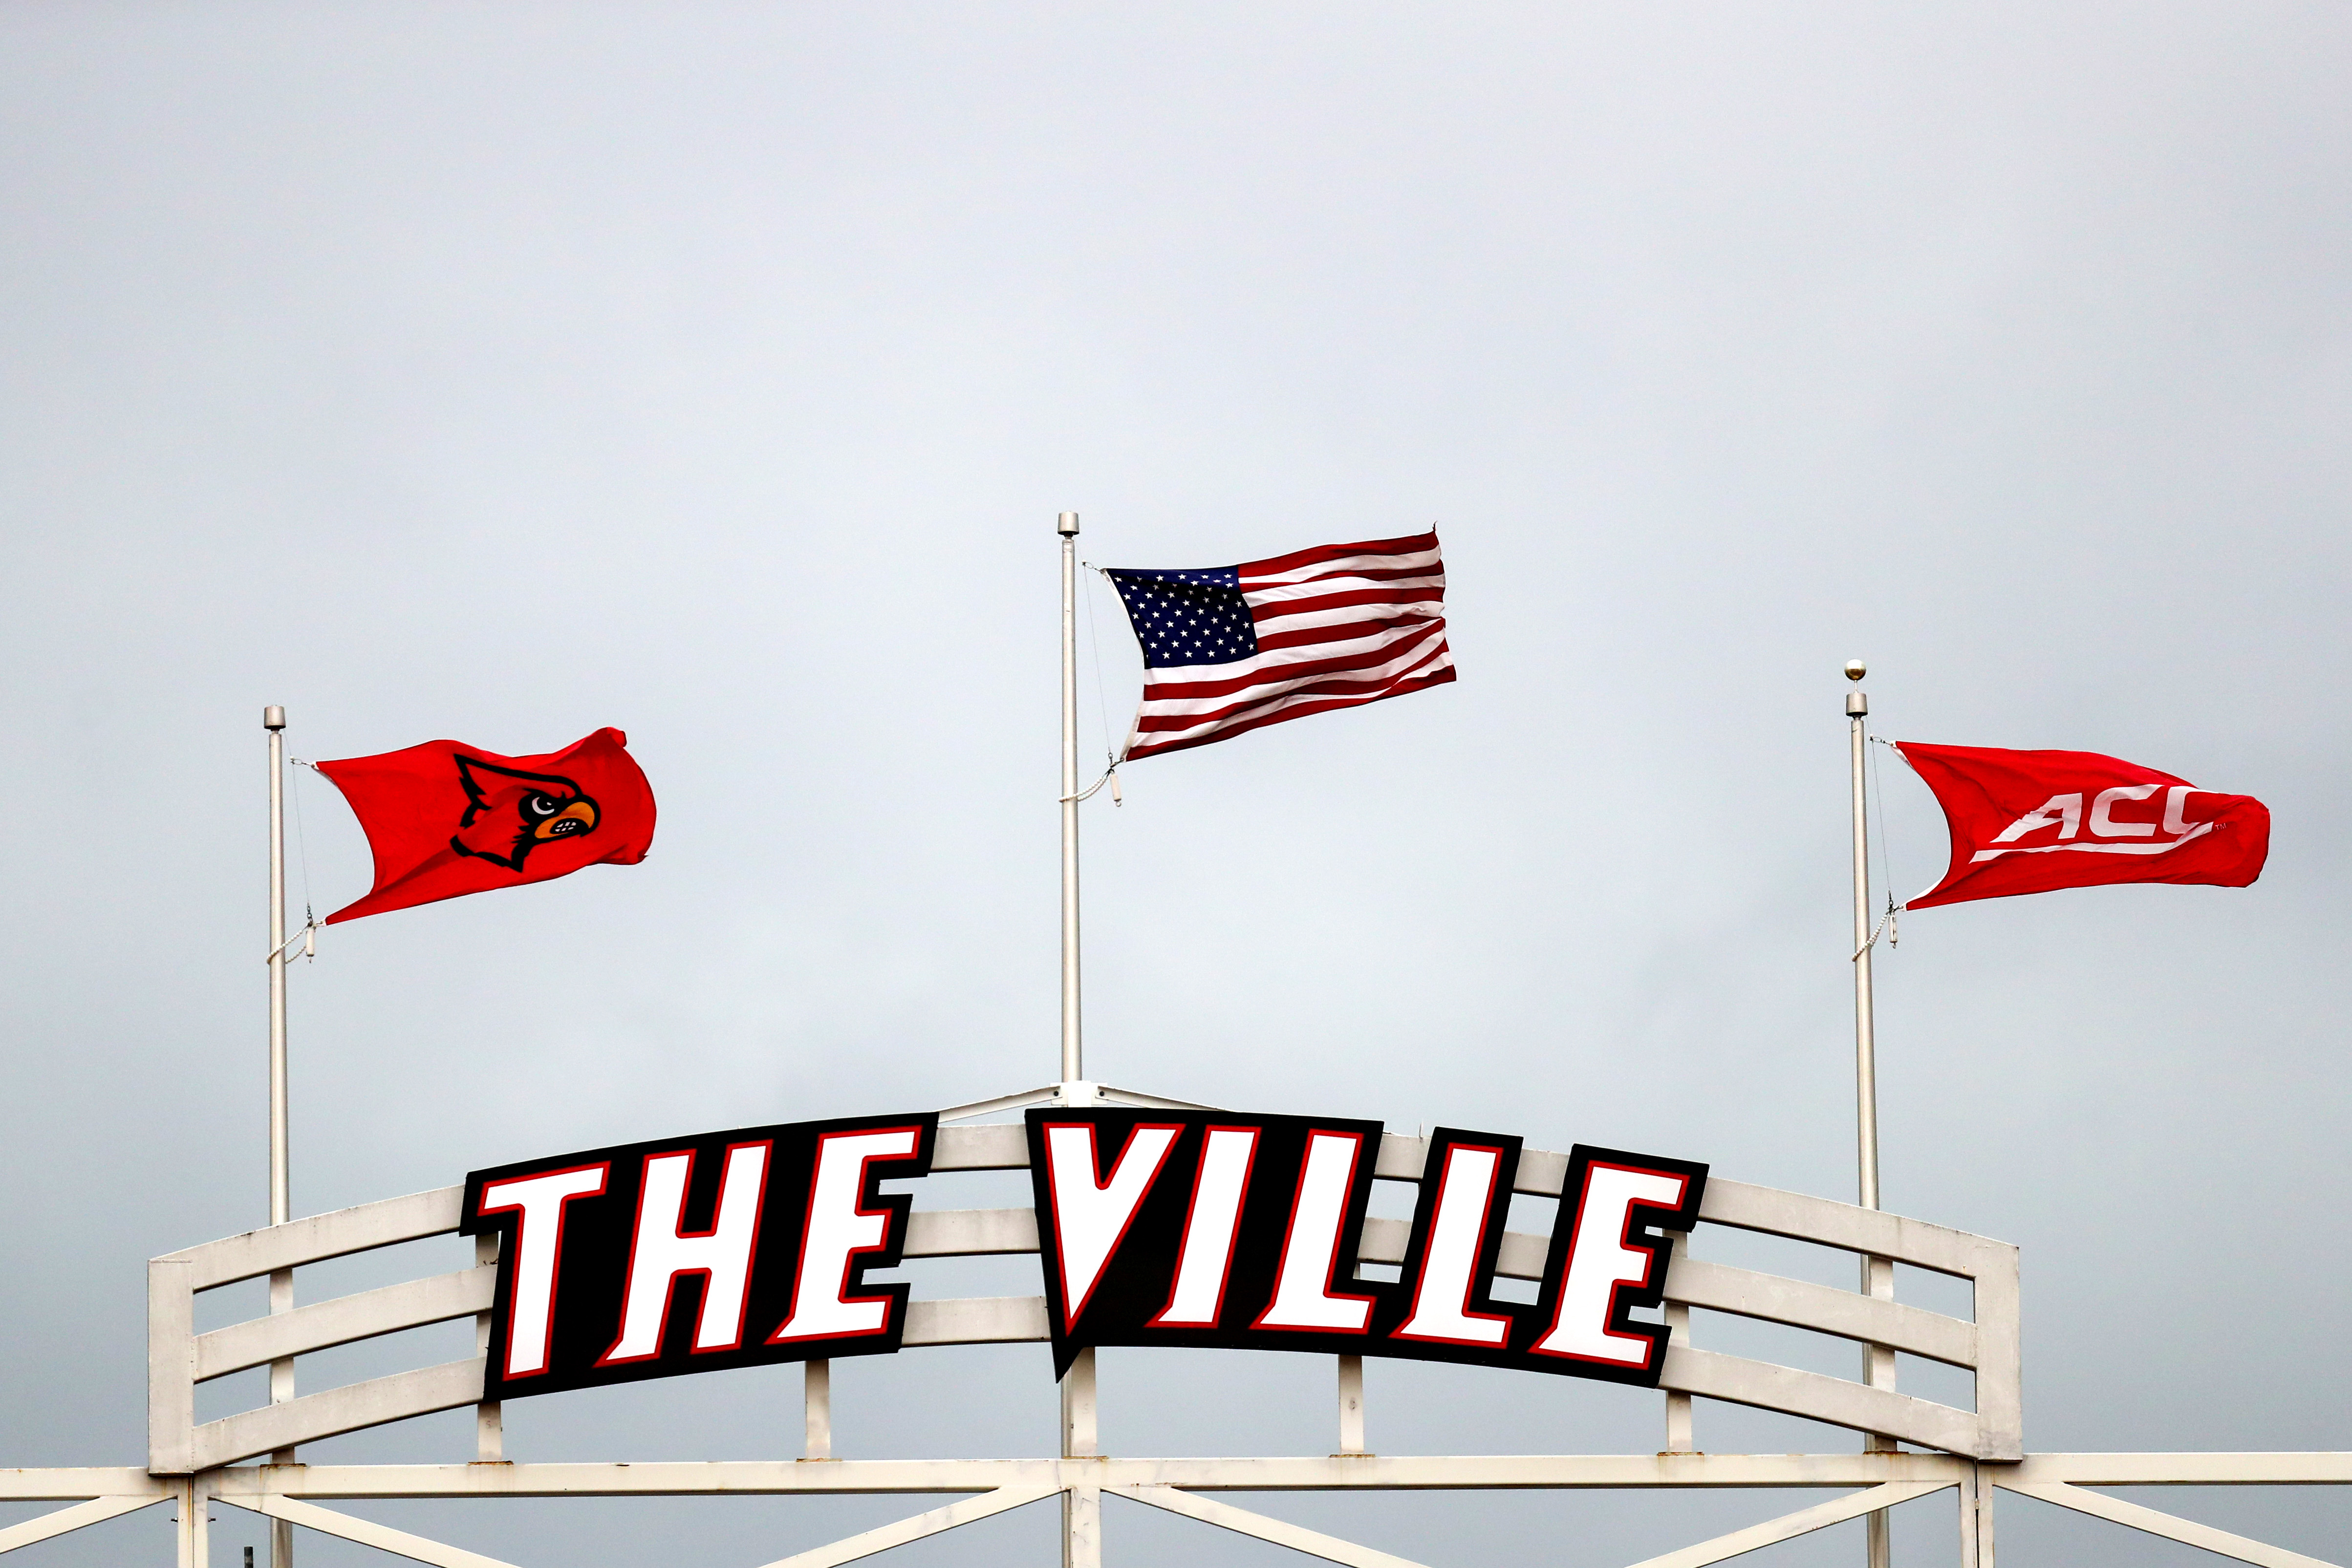 COLLEGE FOOTBALL: OCT 26 Virginia at Louisville